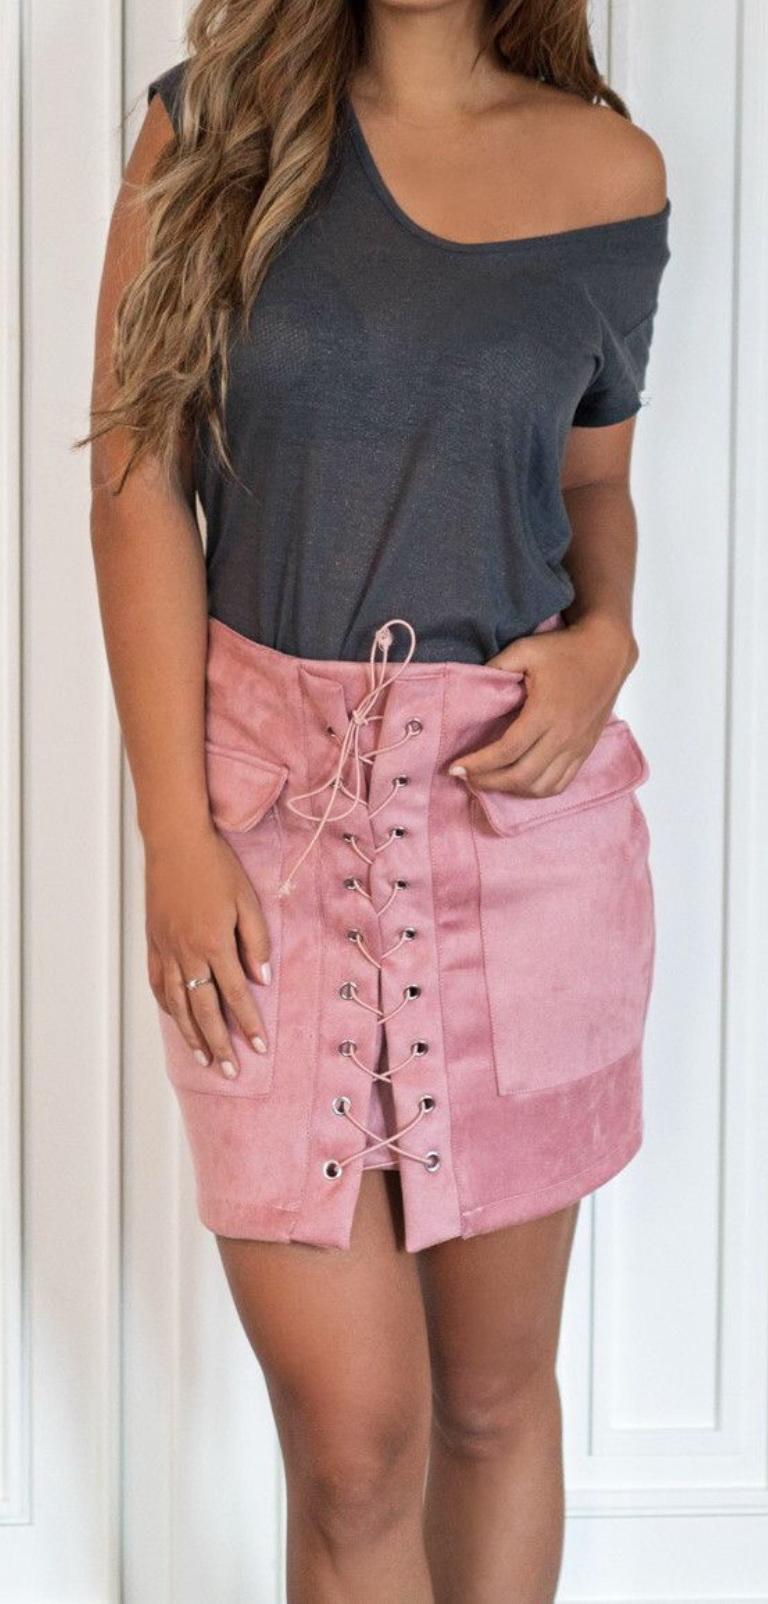 https://blackcoralxo.com/products/persuasian-suede-mini-skirt